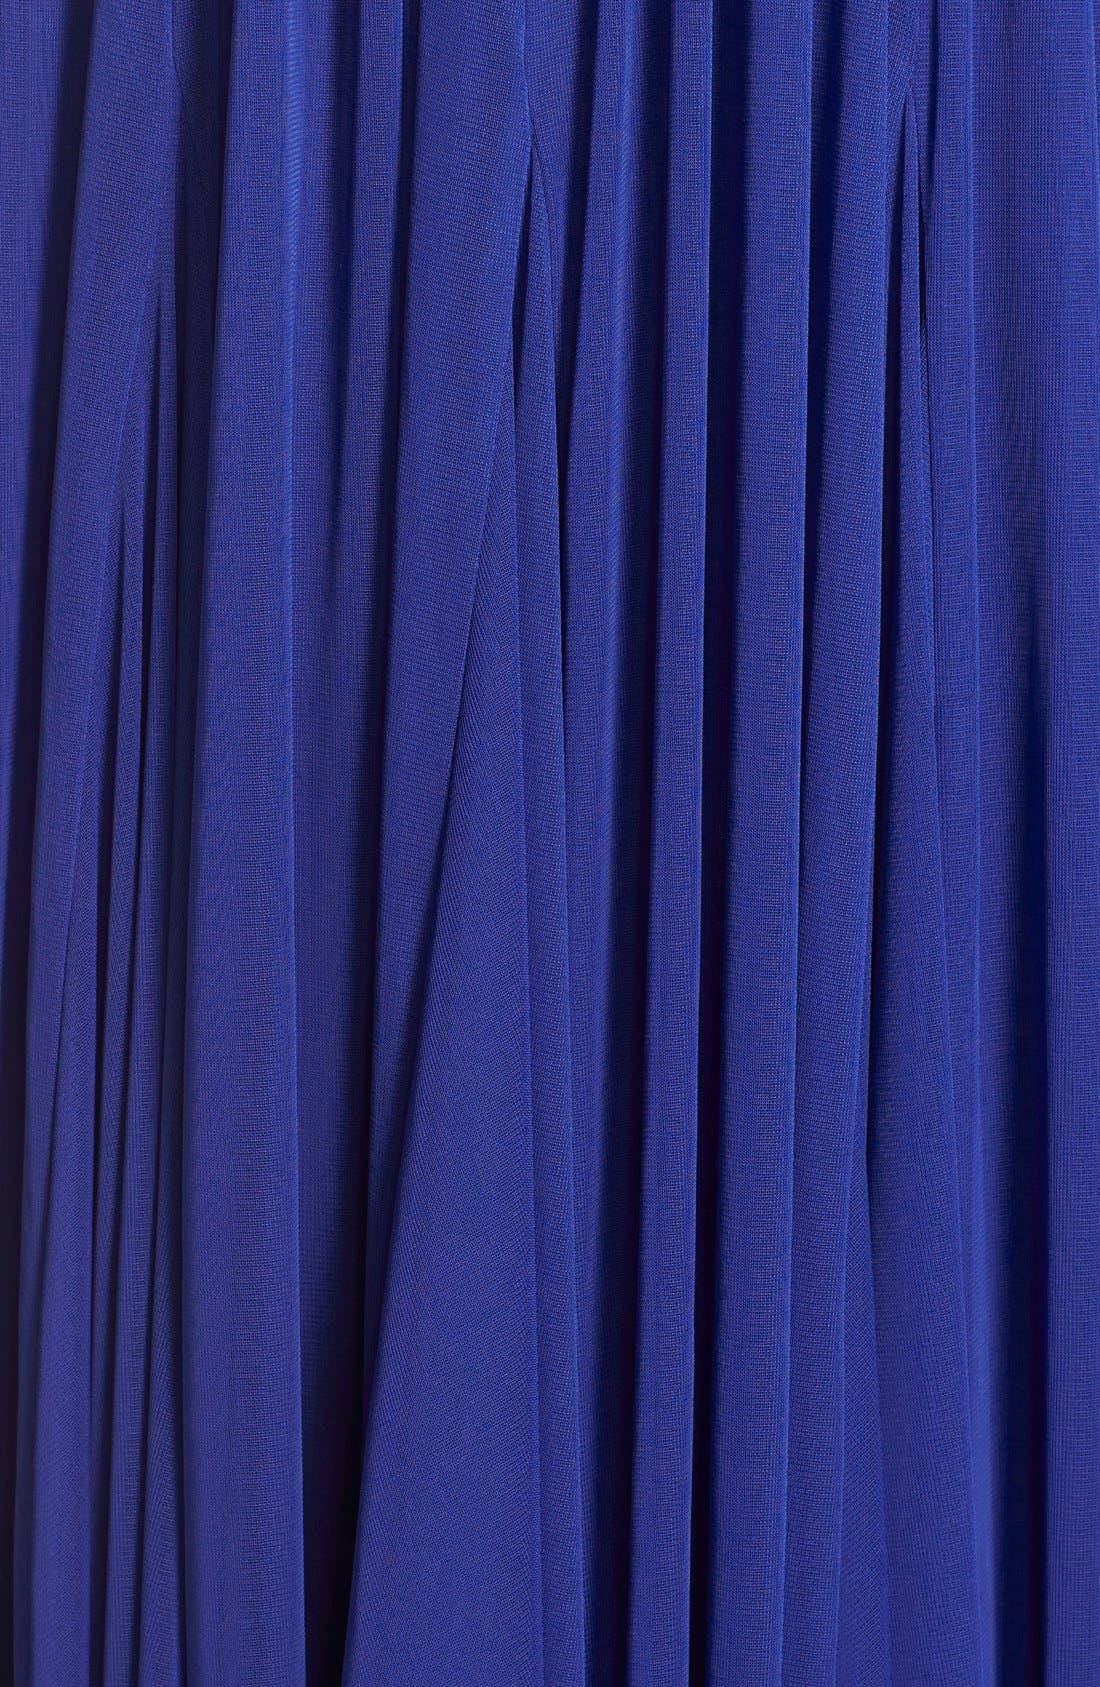 Embellished Tulle Halter Gown,                             Alternate thumbnail 5, color,                             Neptune